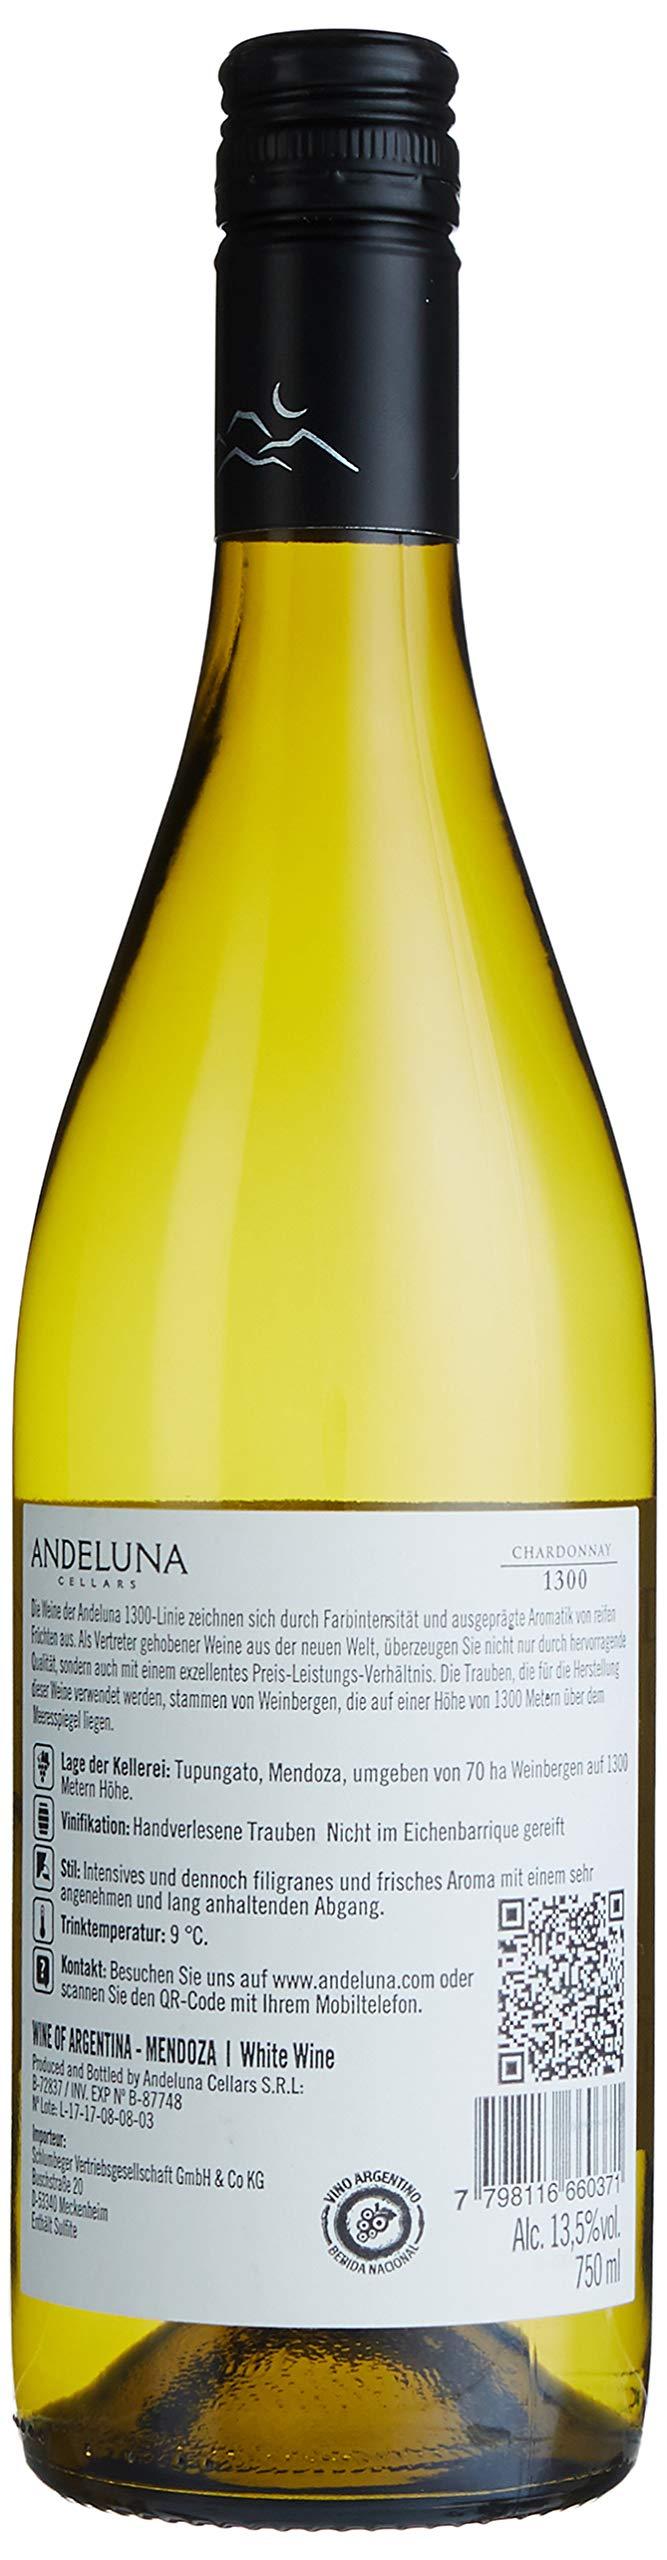 Andeluna-Cellars-1300-2017-trocken